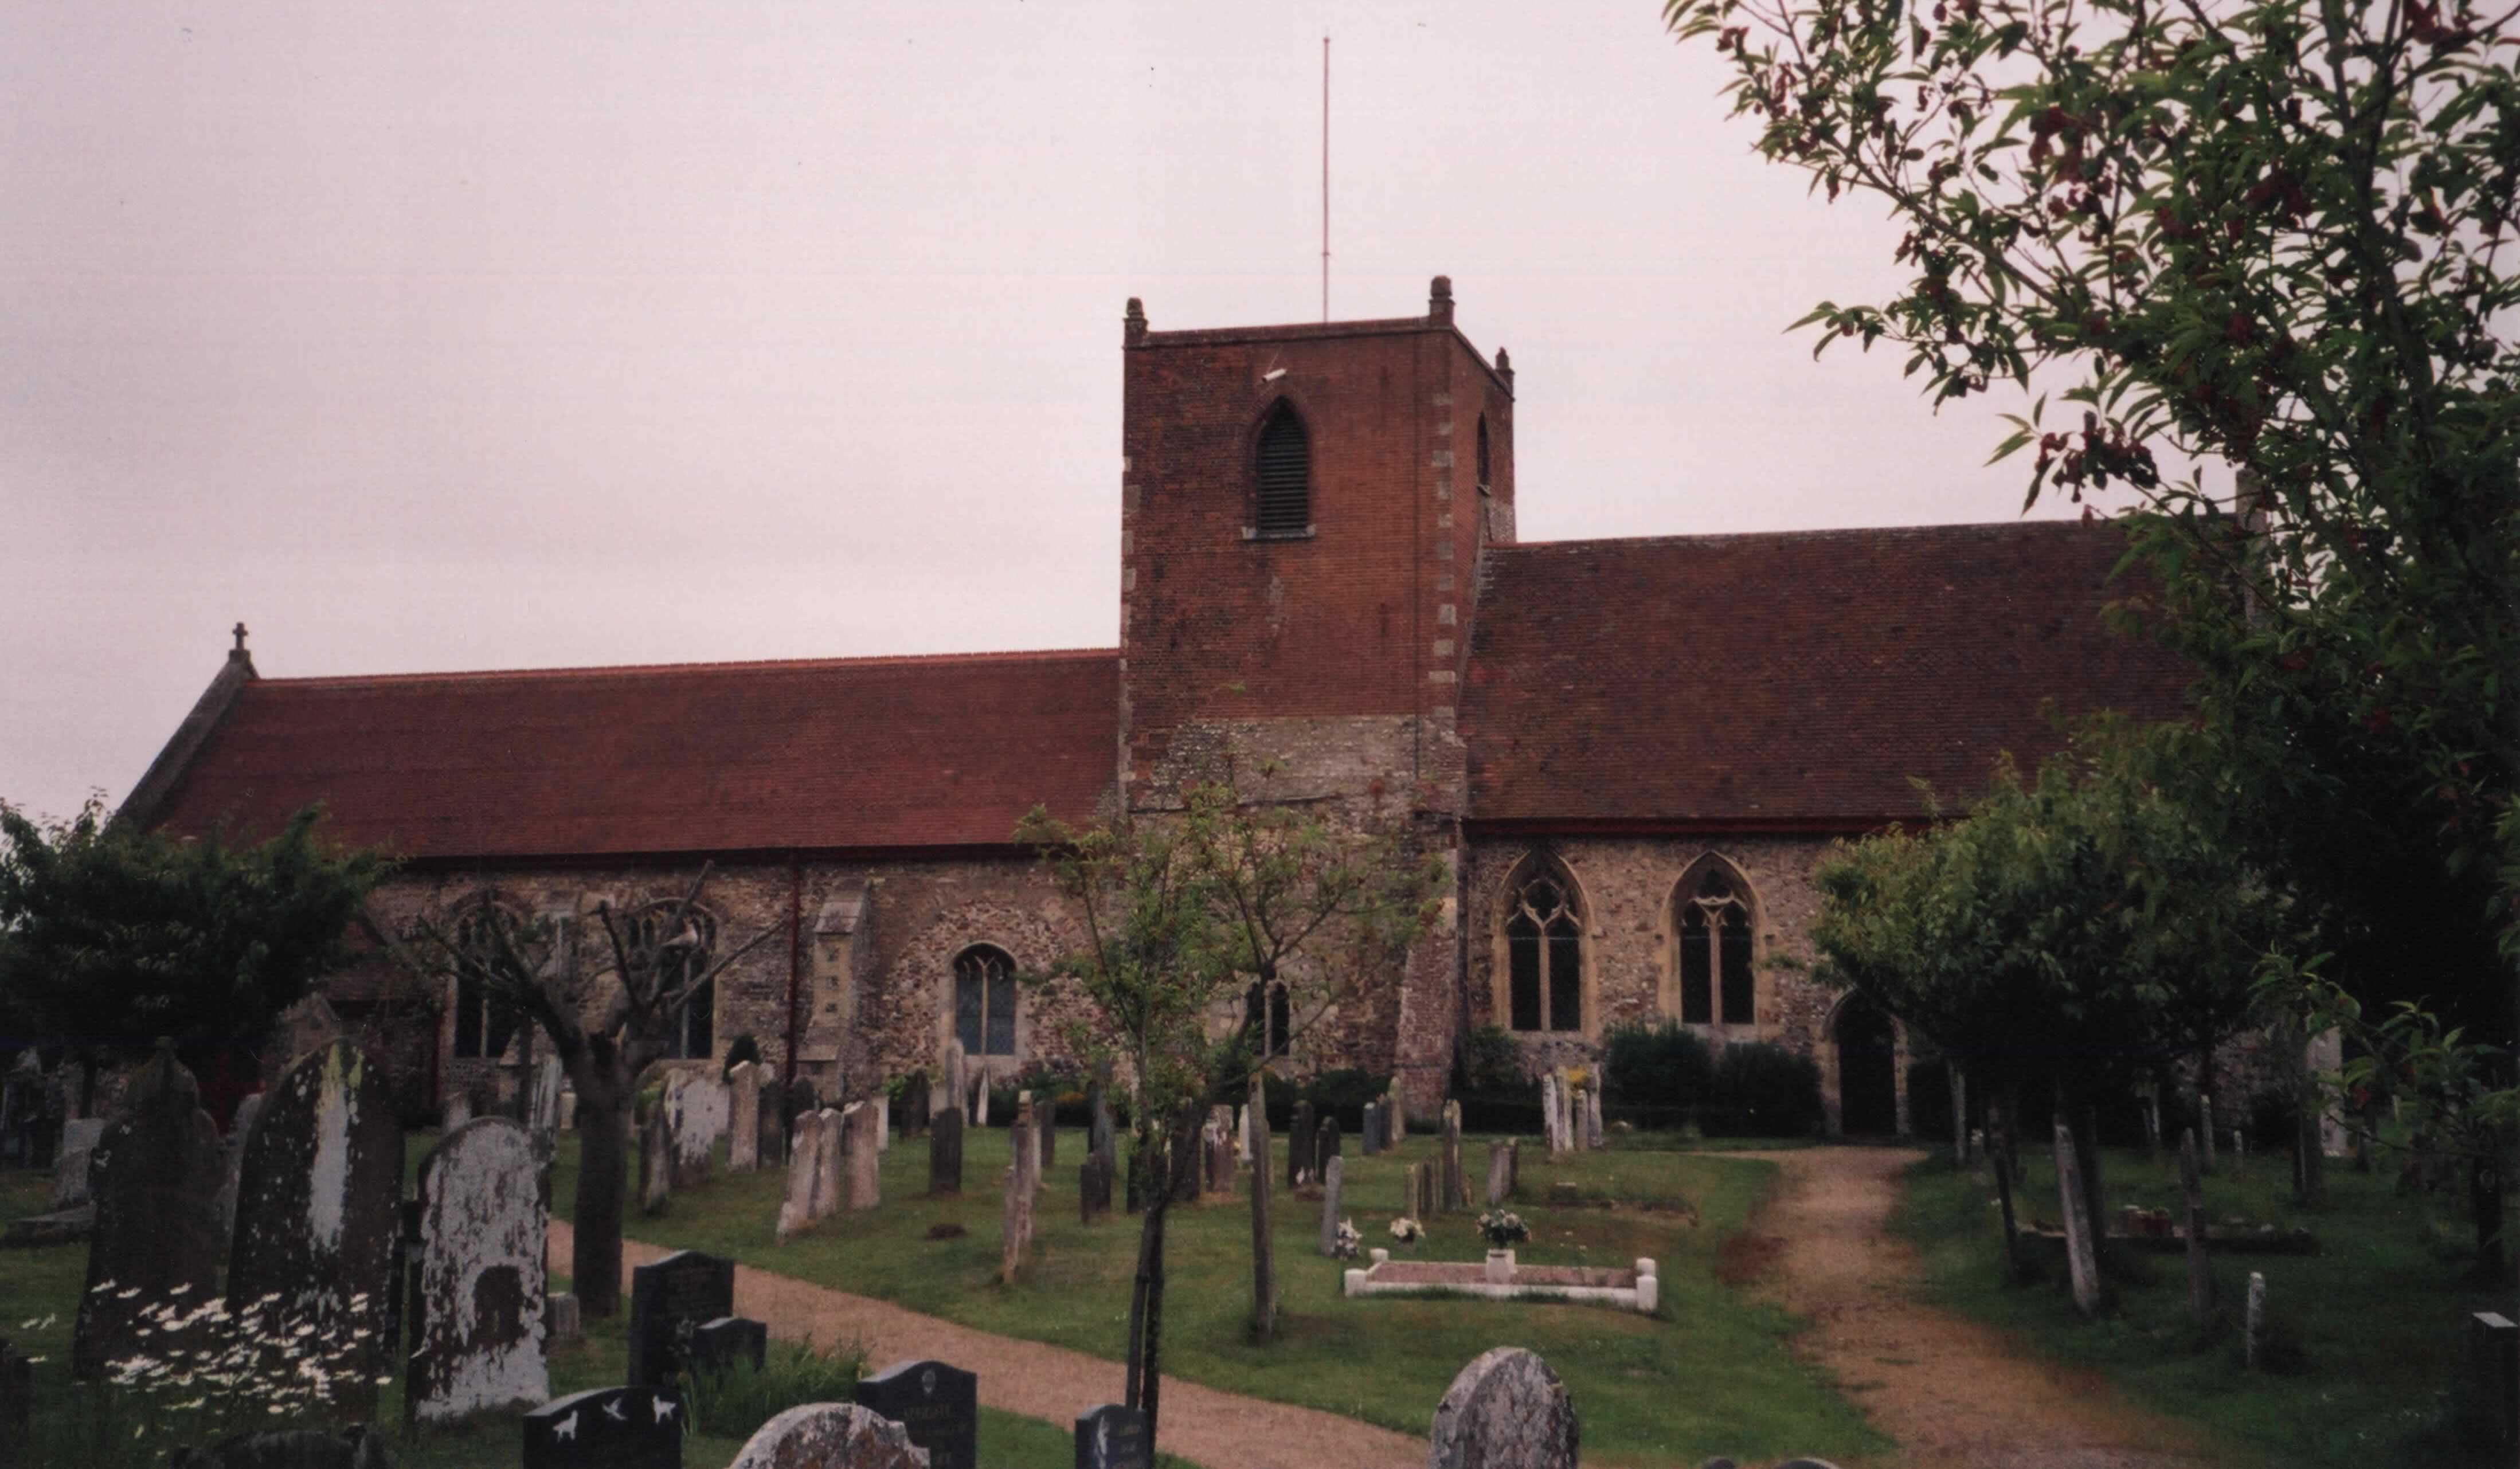 Oulton St Michael